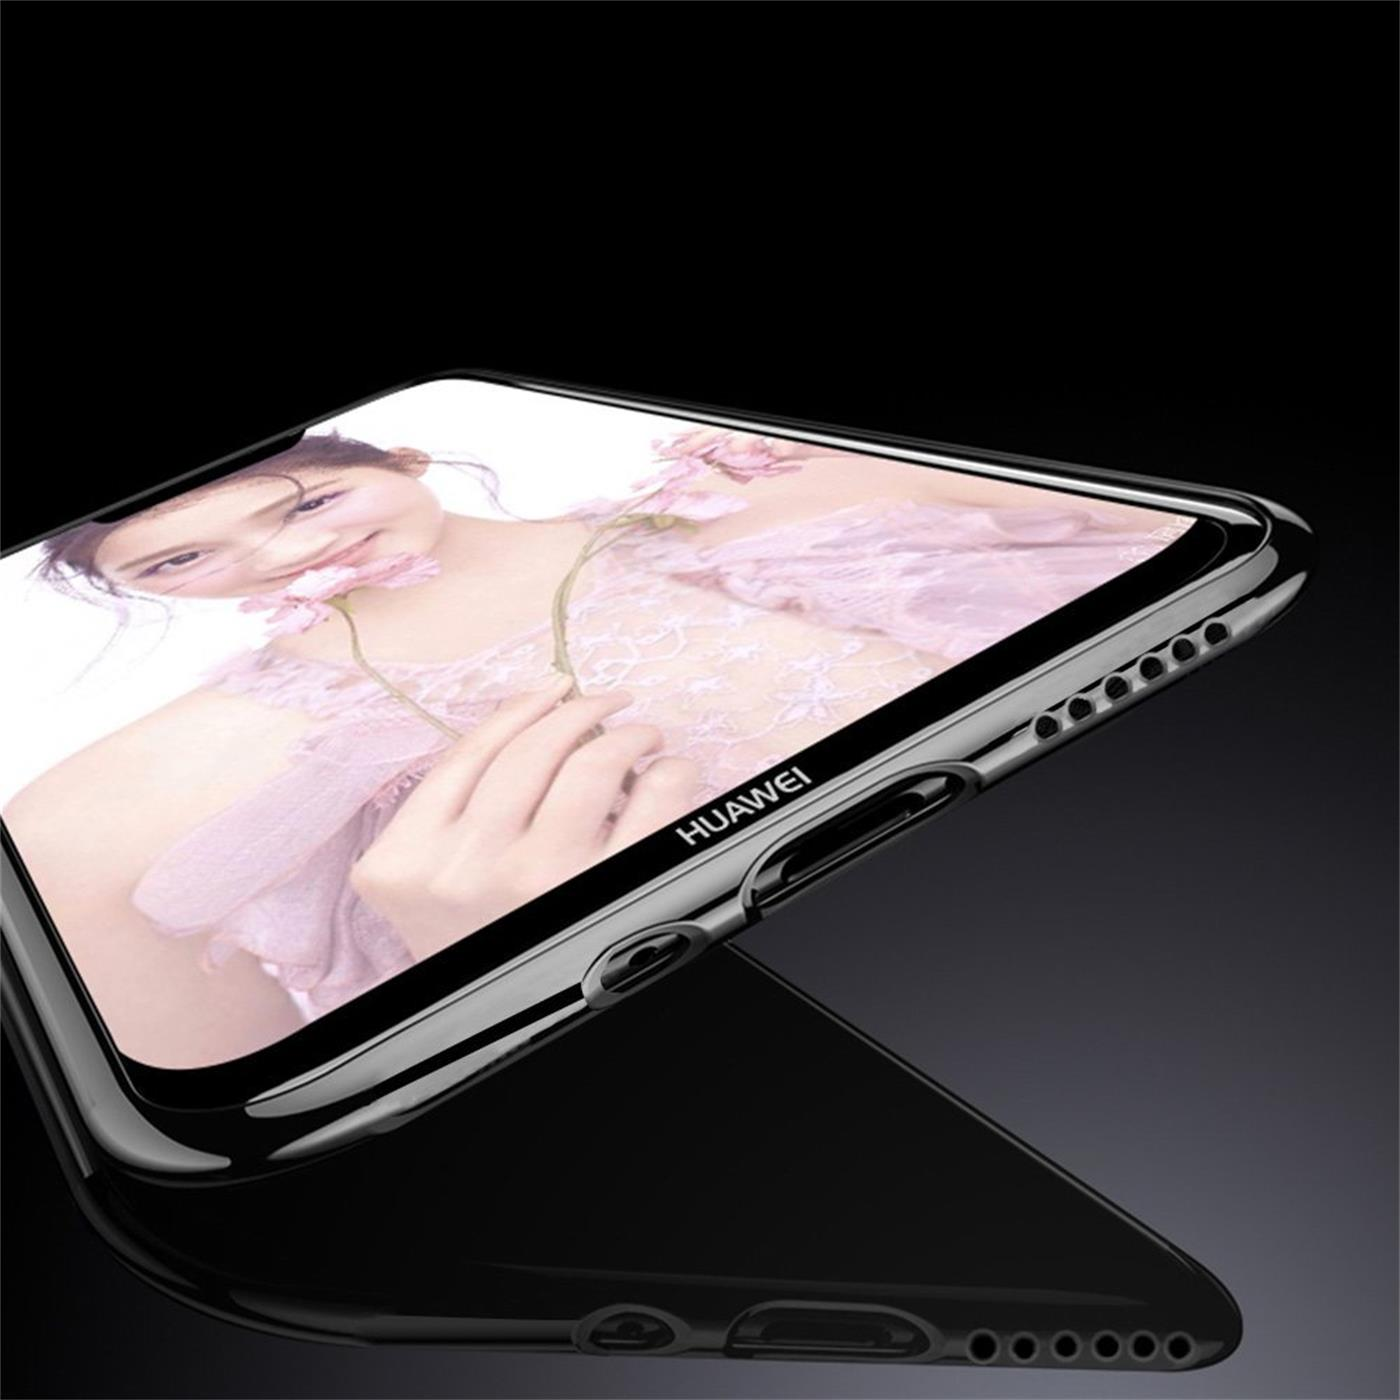 Silikon-Klar-Case-fuer-Huawei-p20-Lite-Ultra-Slim-Stossfeste-Gel-Rueckseite Indexbild 9